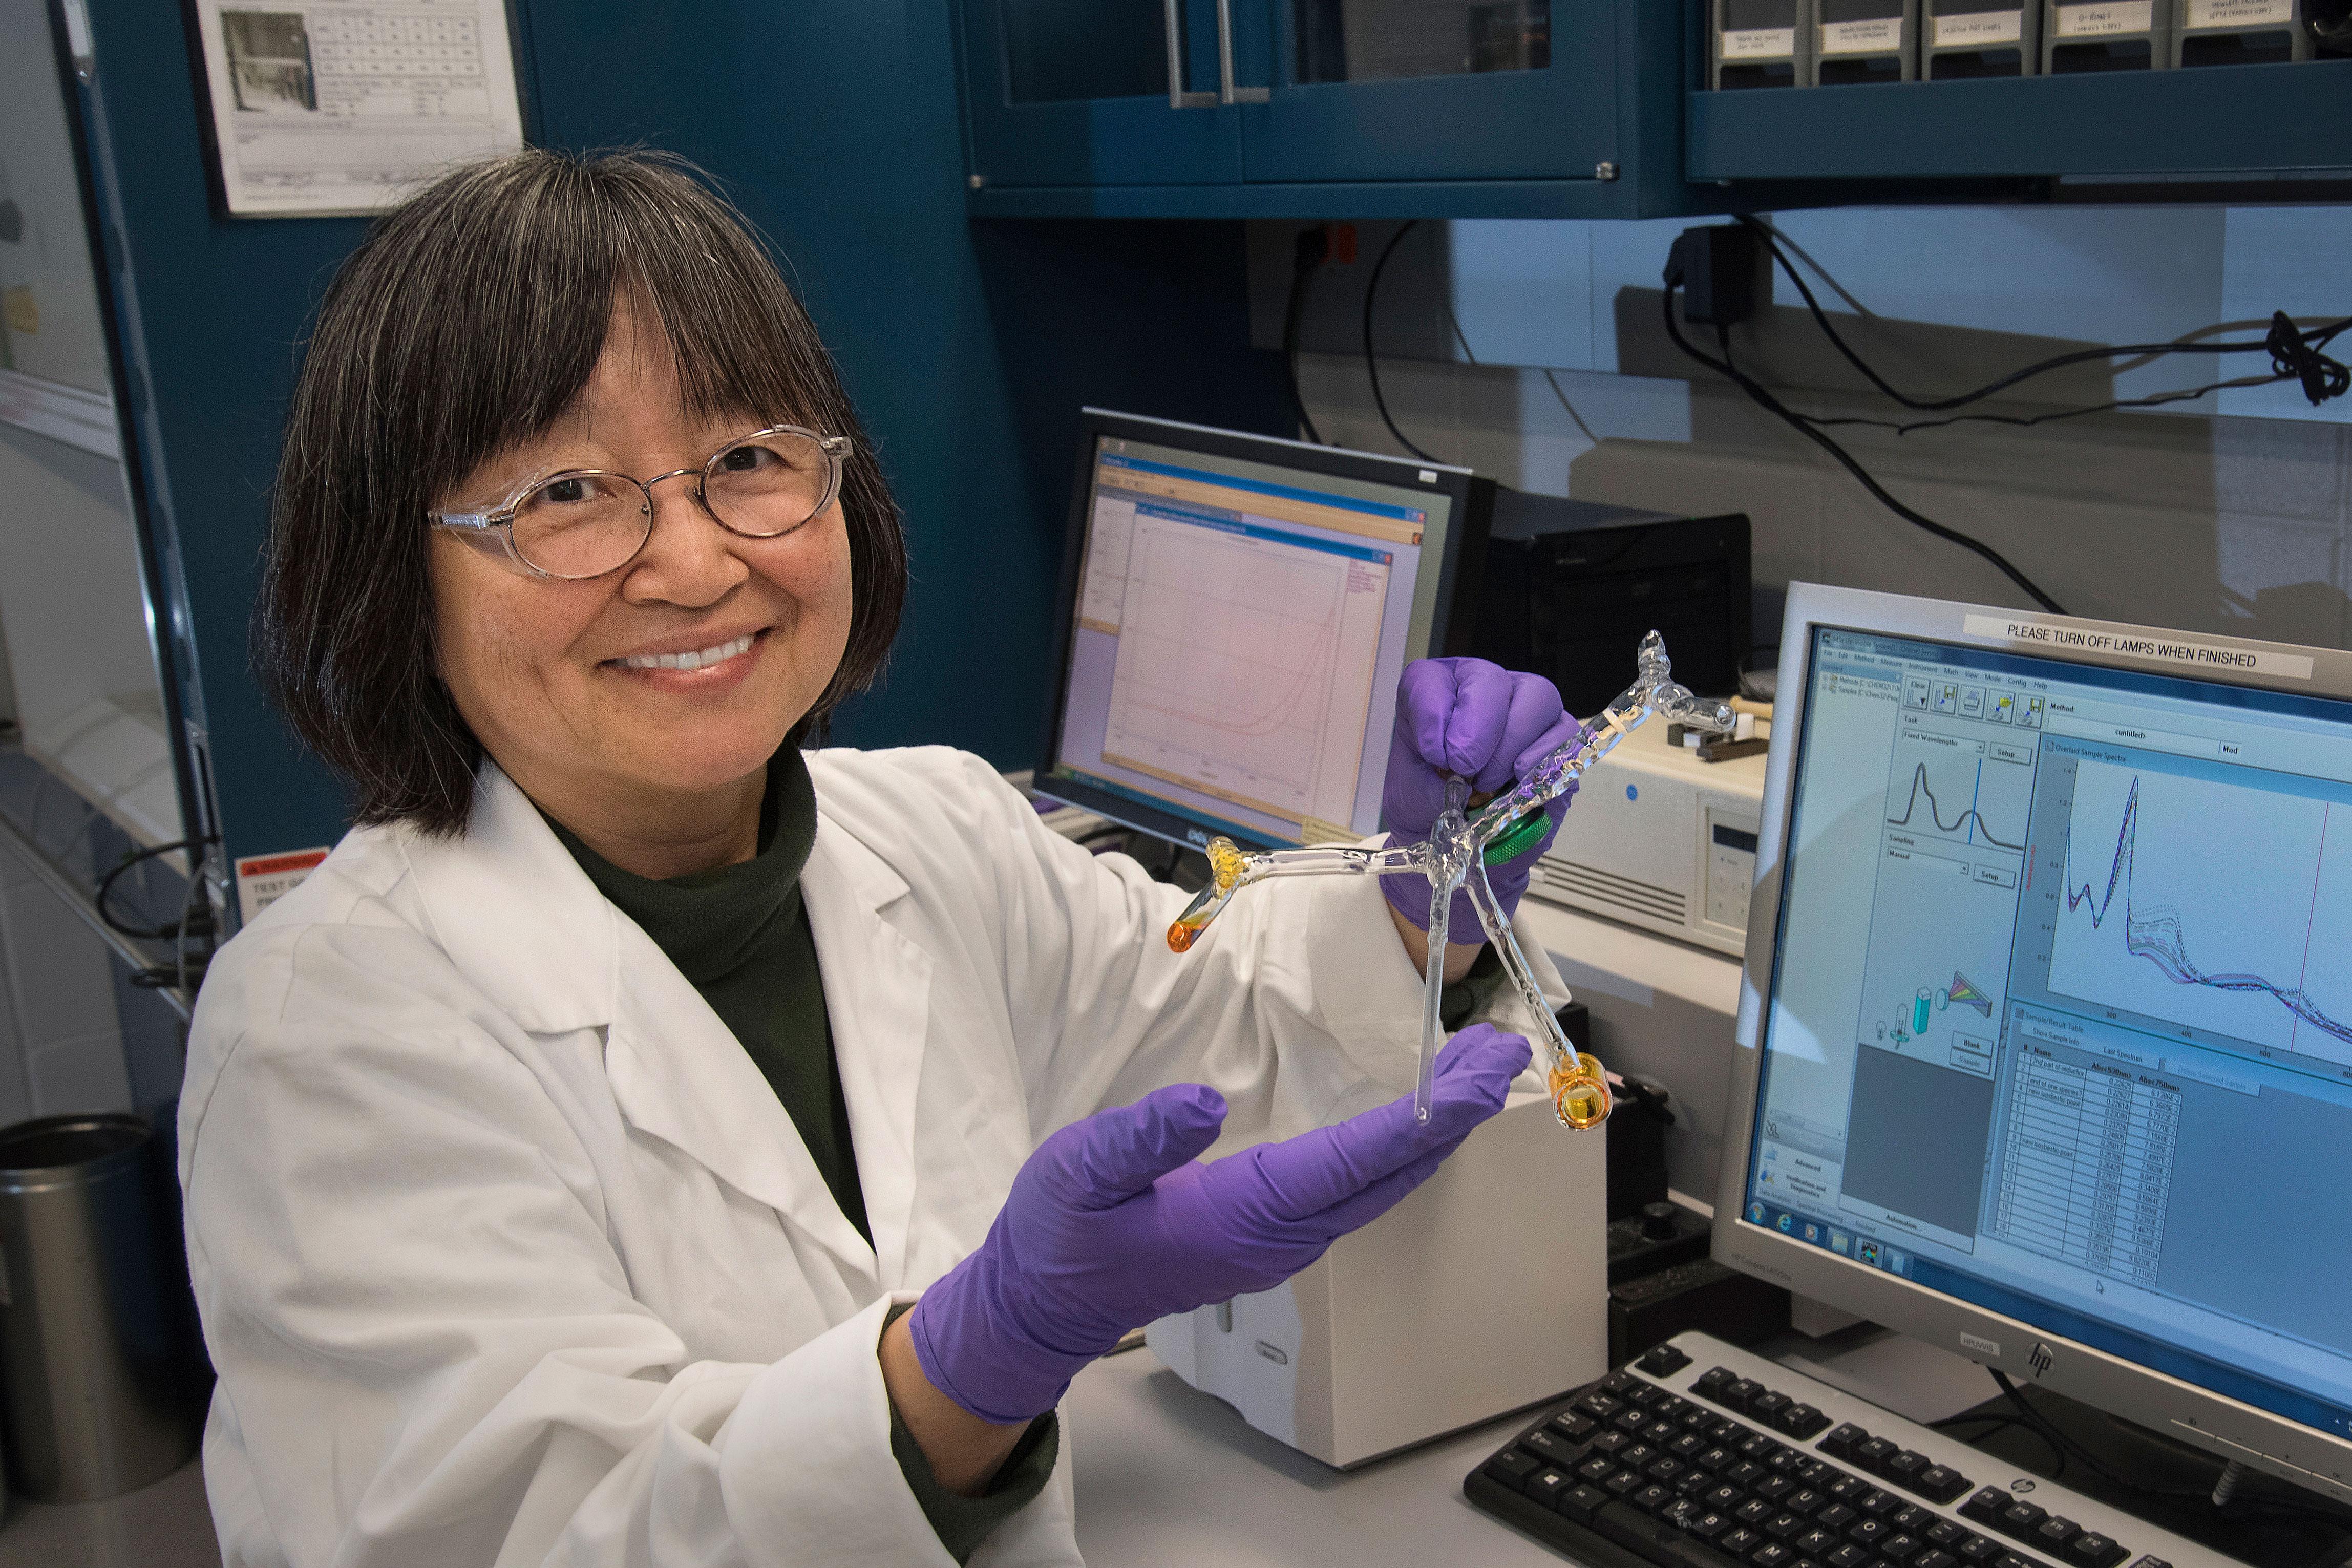 click on the image to download a high resolution version brookhaven lab chemist etsuko fujita